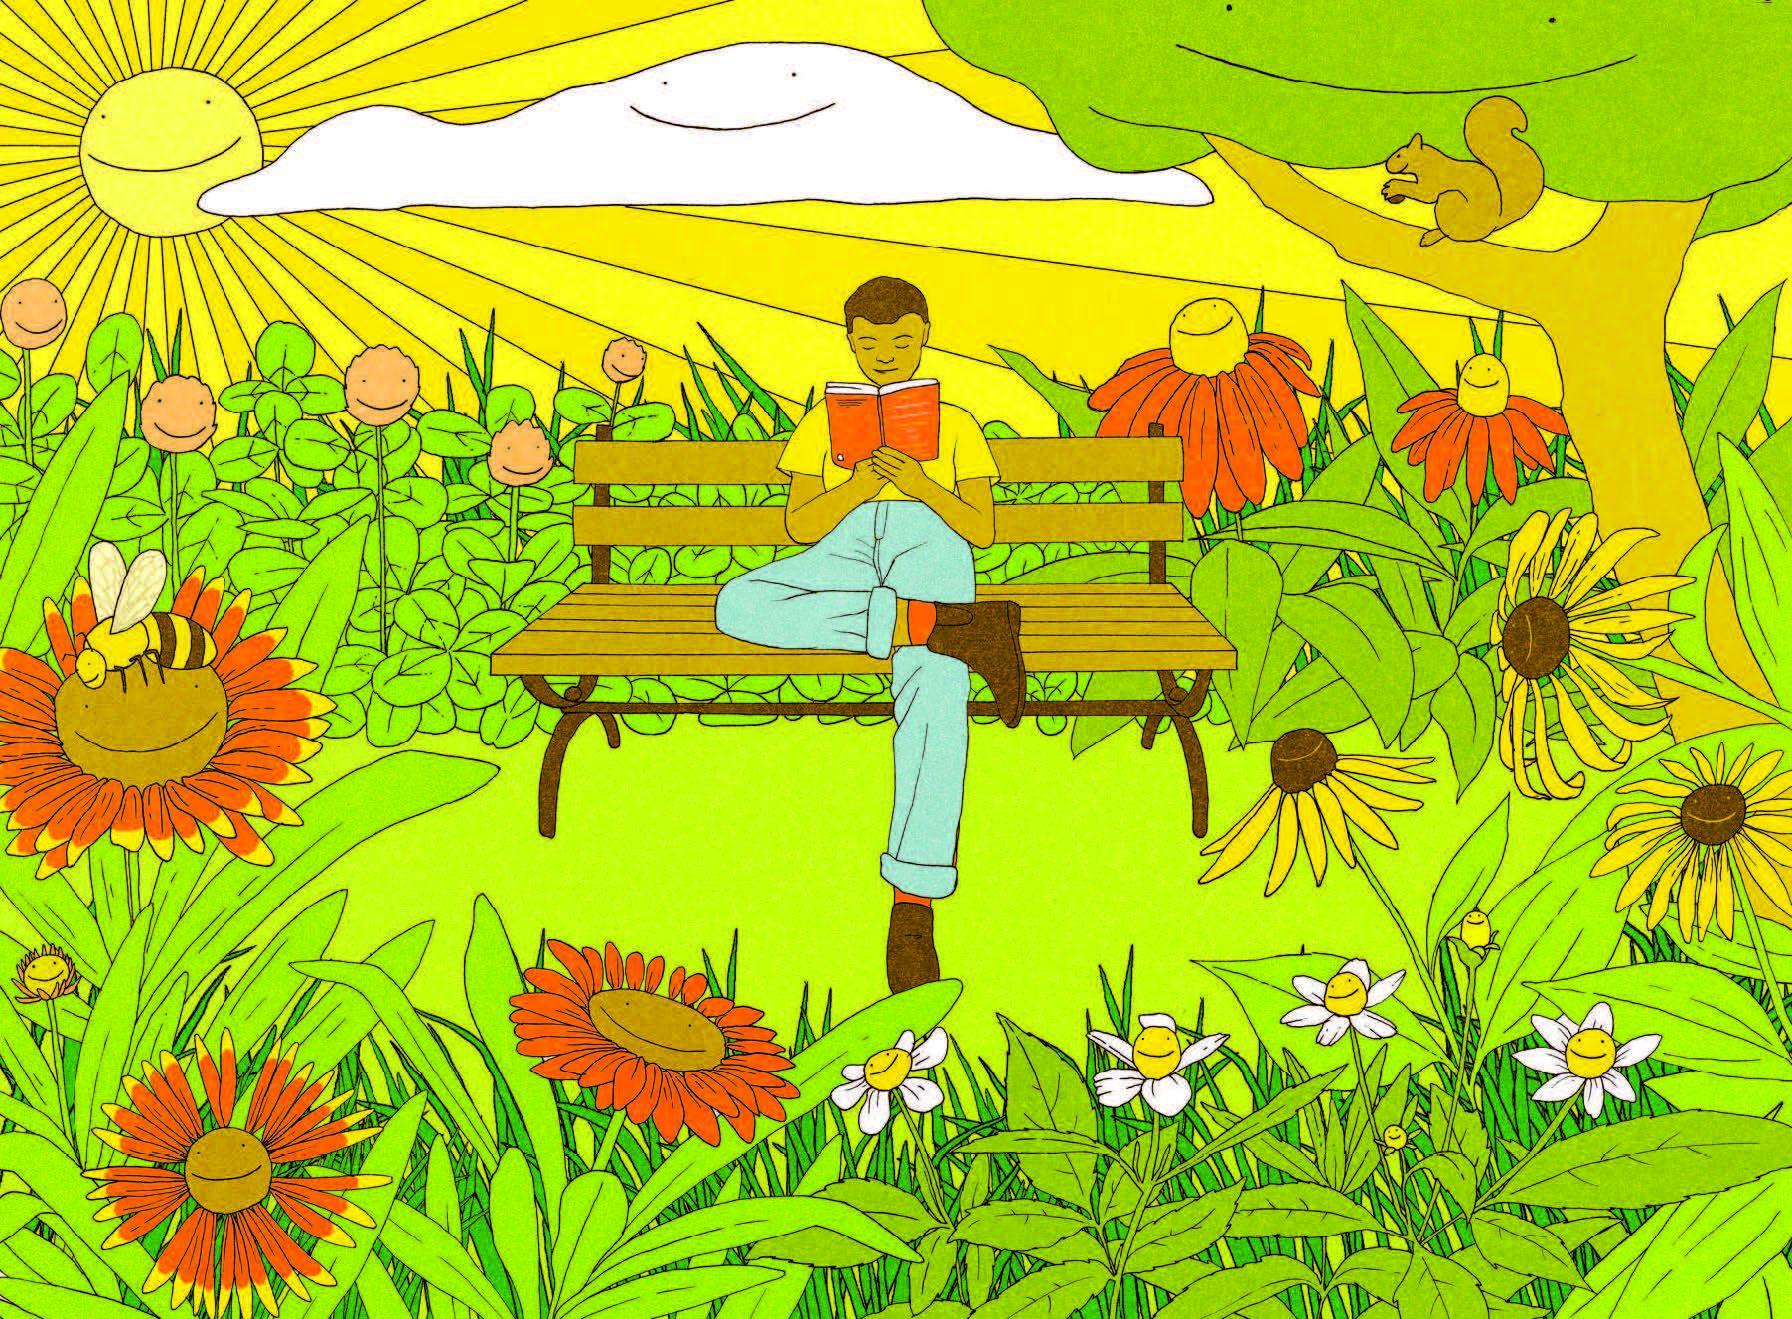 garance-illustration-Emma-Roulette-Washington-Post-Summer-Reads